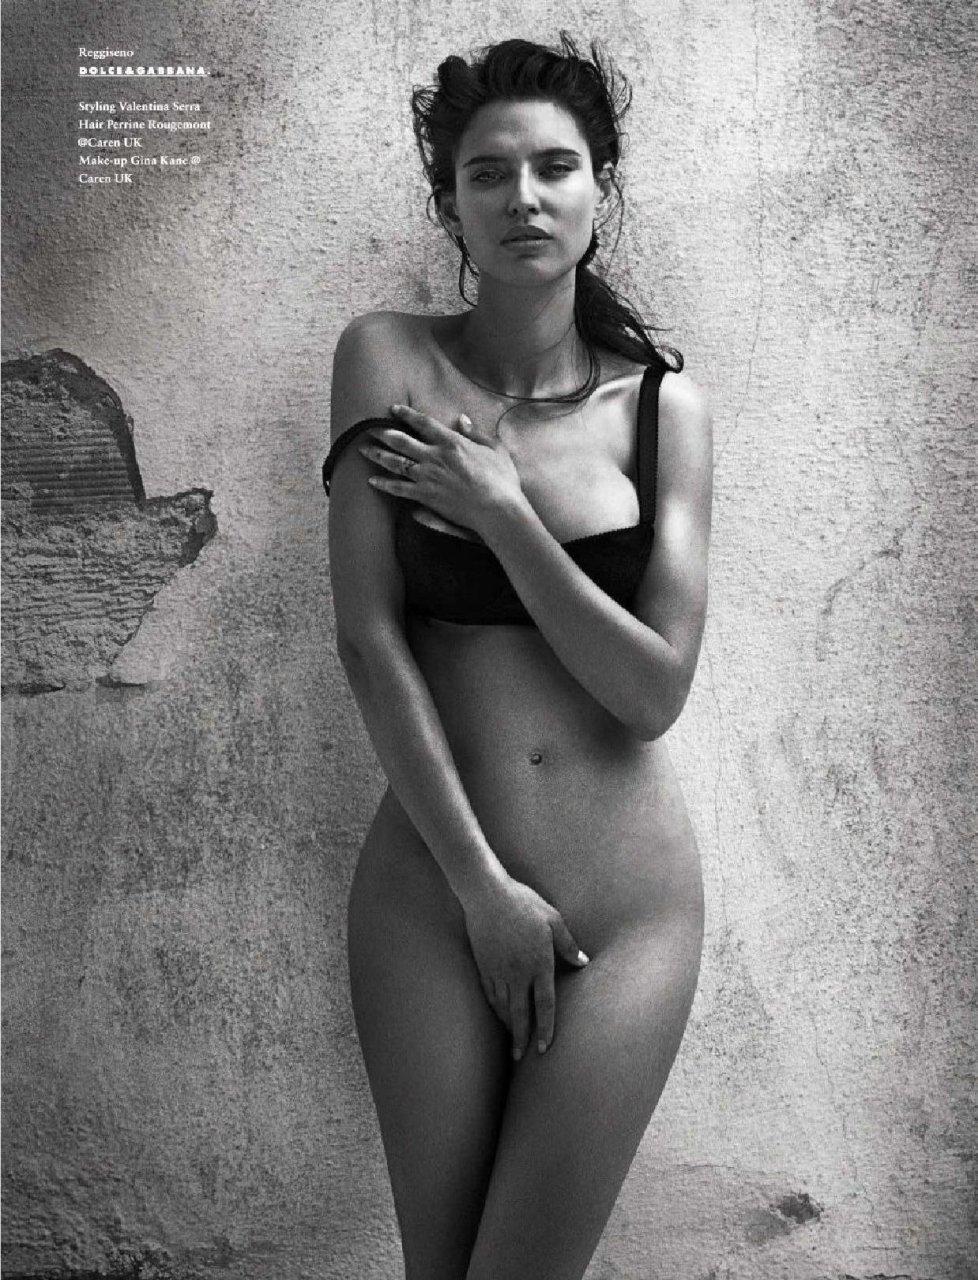 bianka naked